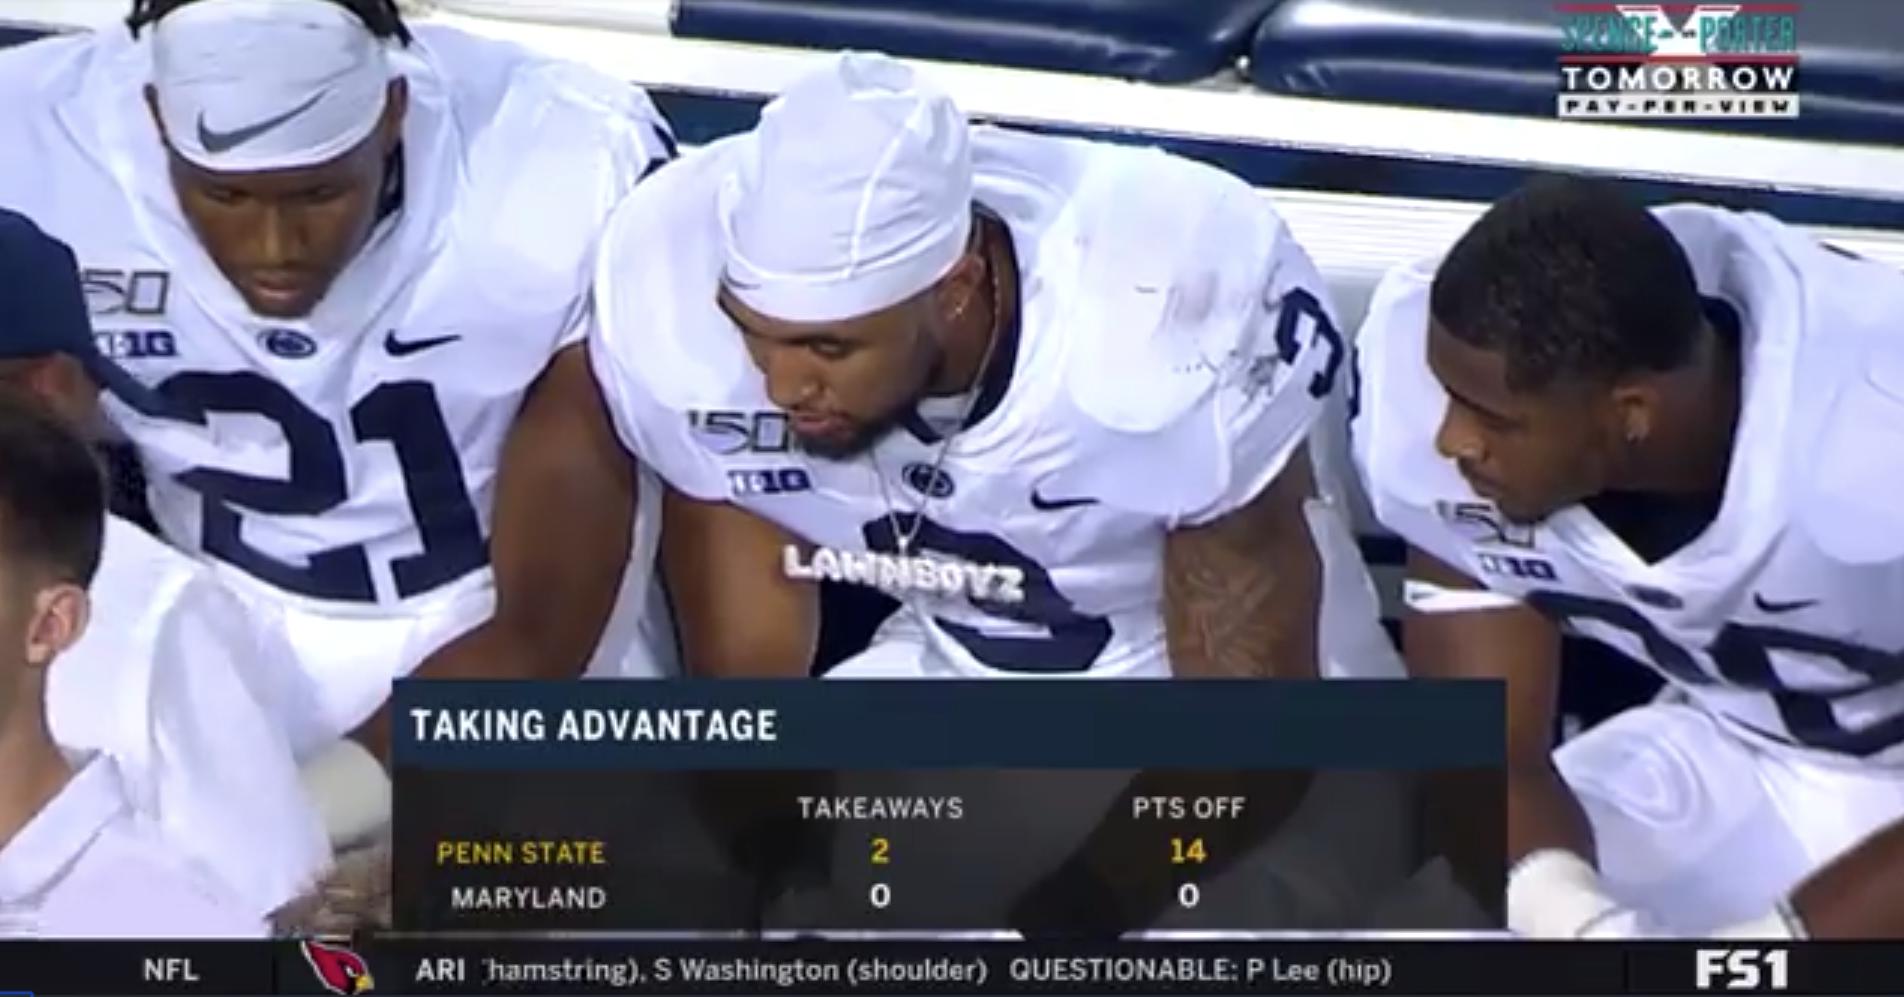 LOOK: Penn State running backs have a Lawn Boyz chain